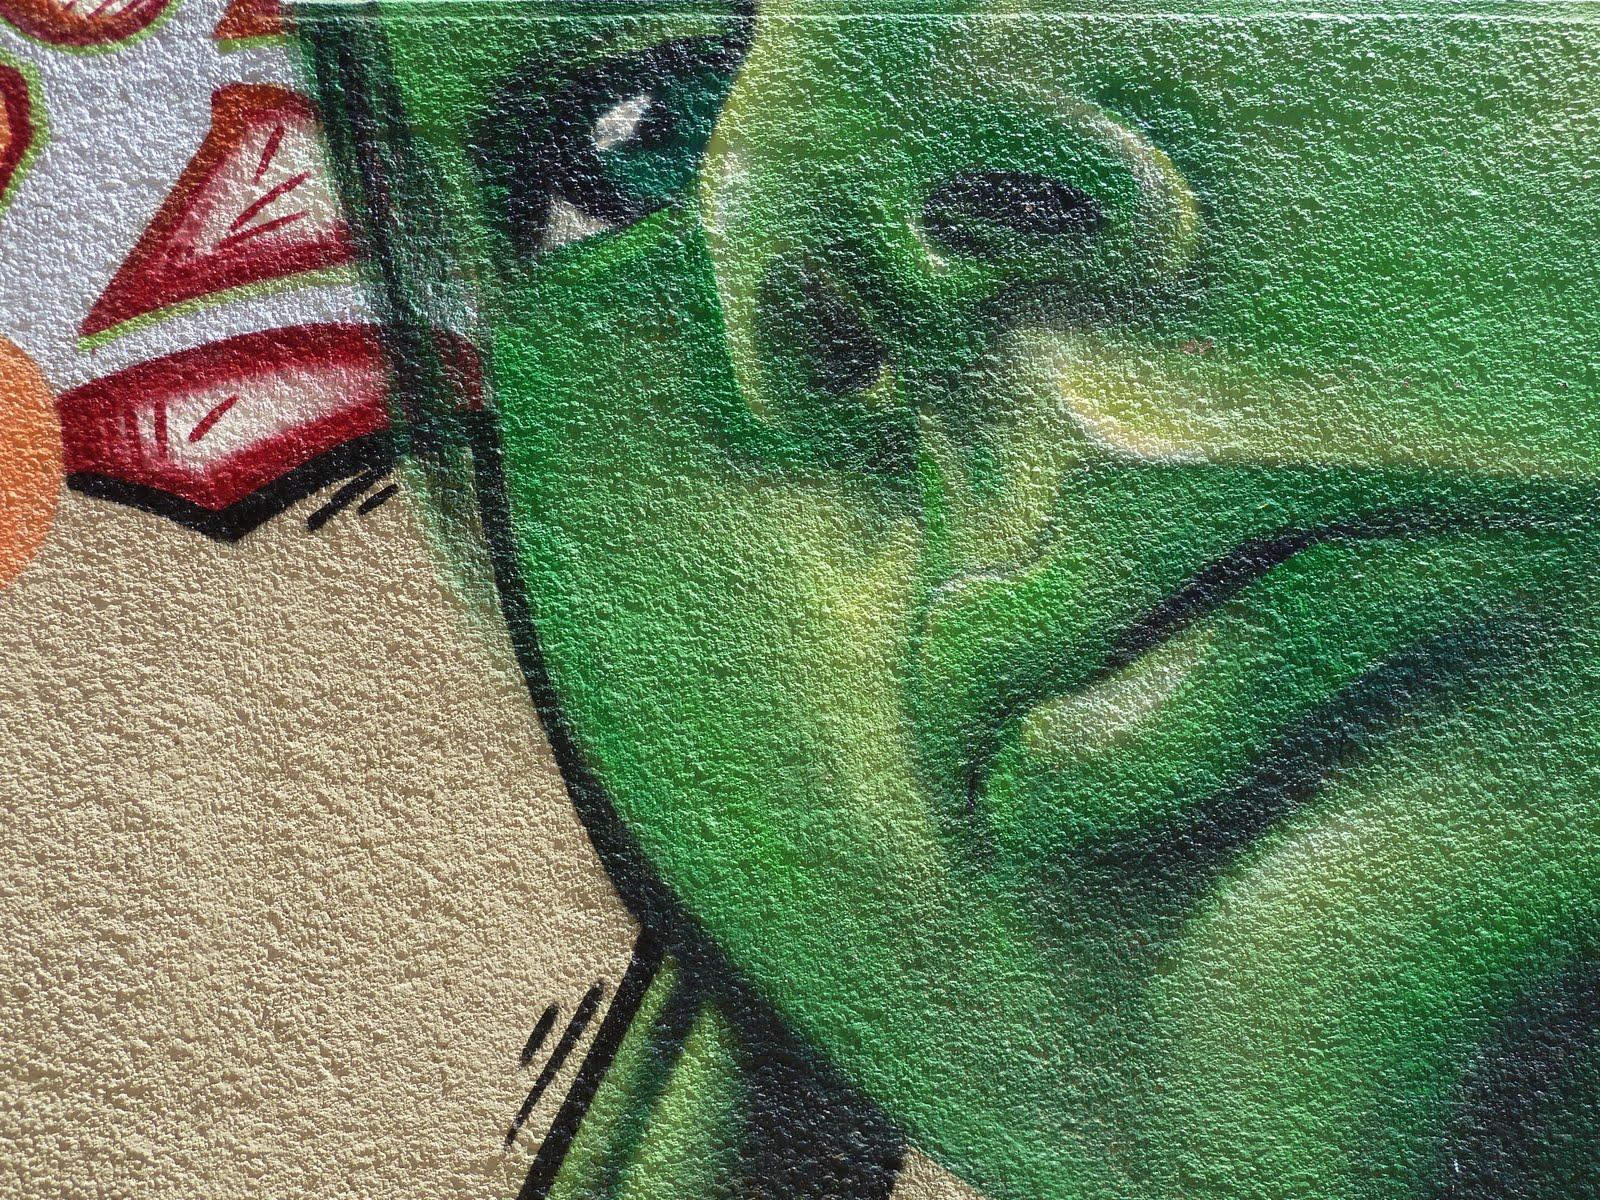 Peinture murale de Valparaíso